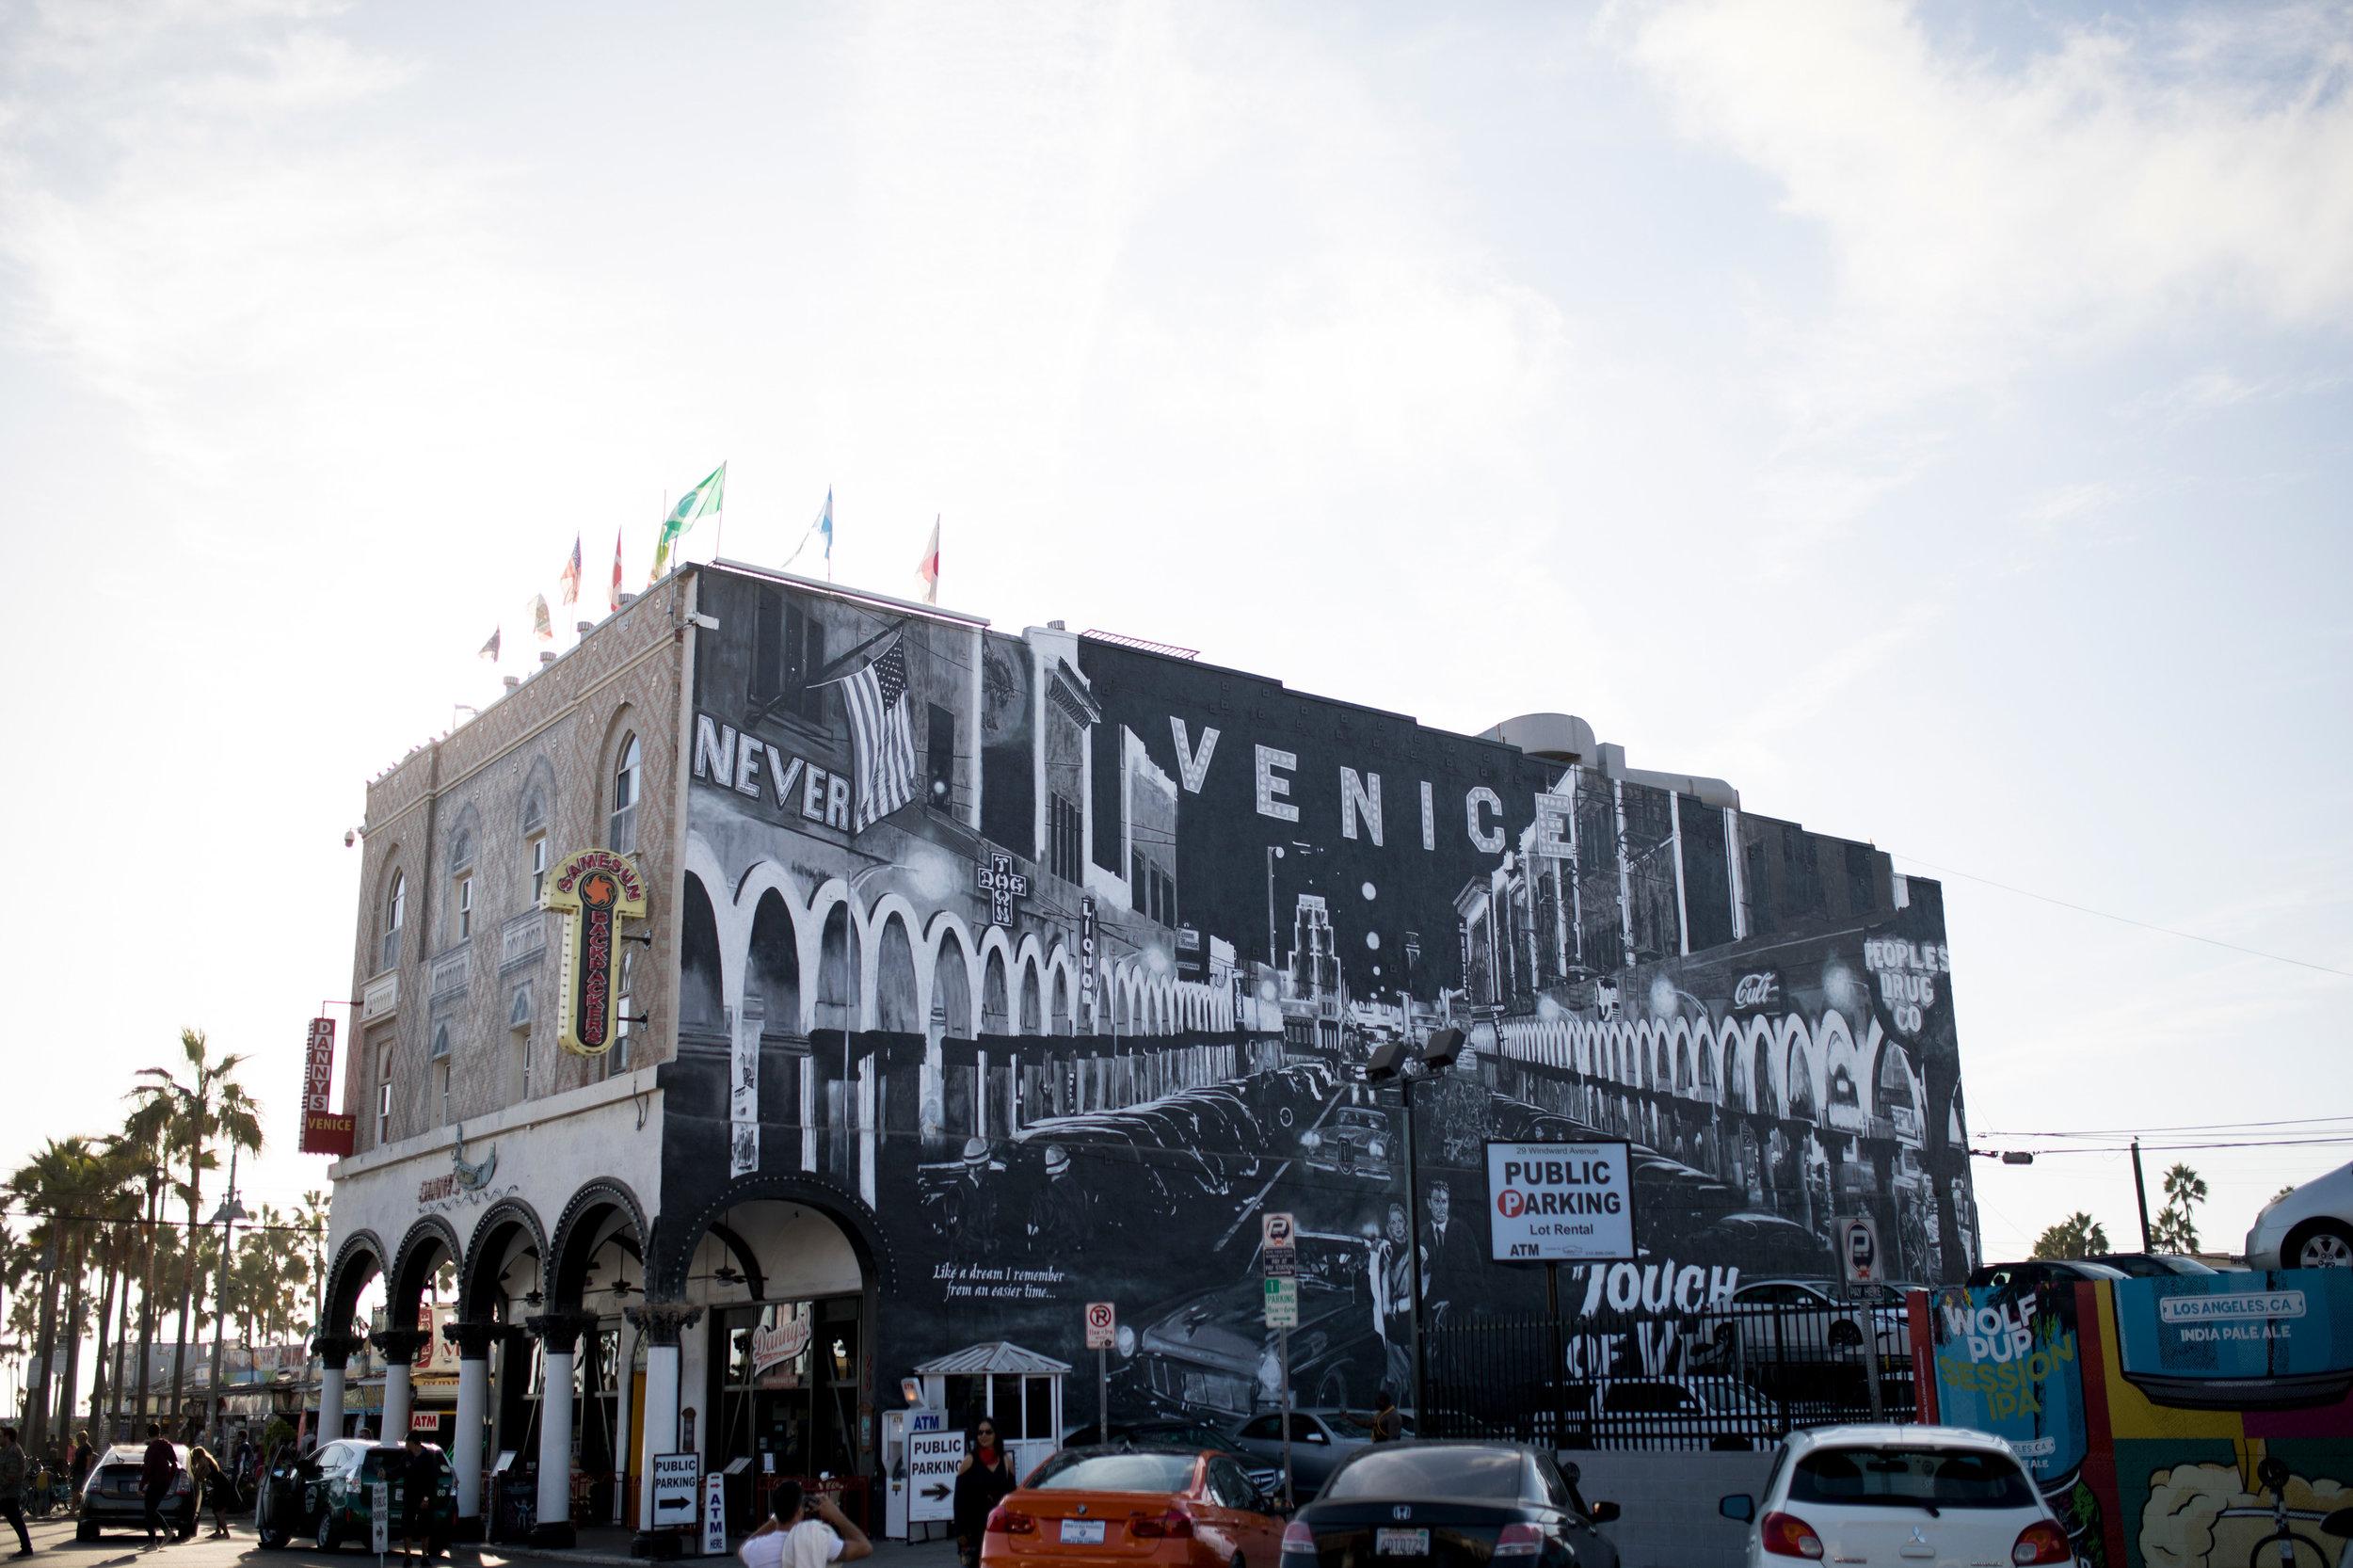 Venice Beach city street art and photogrphy